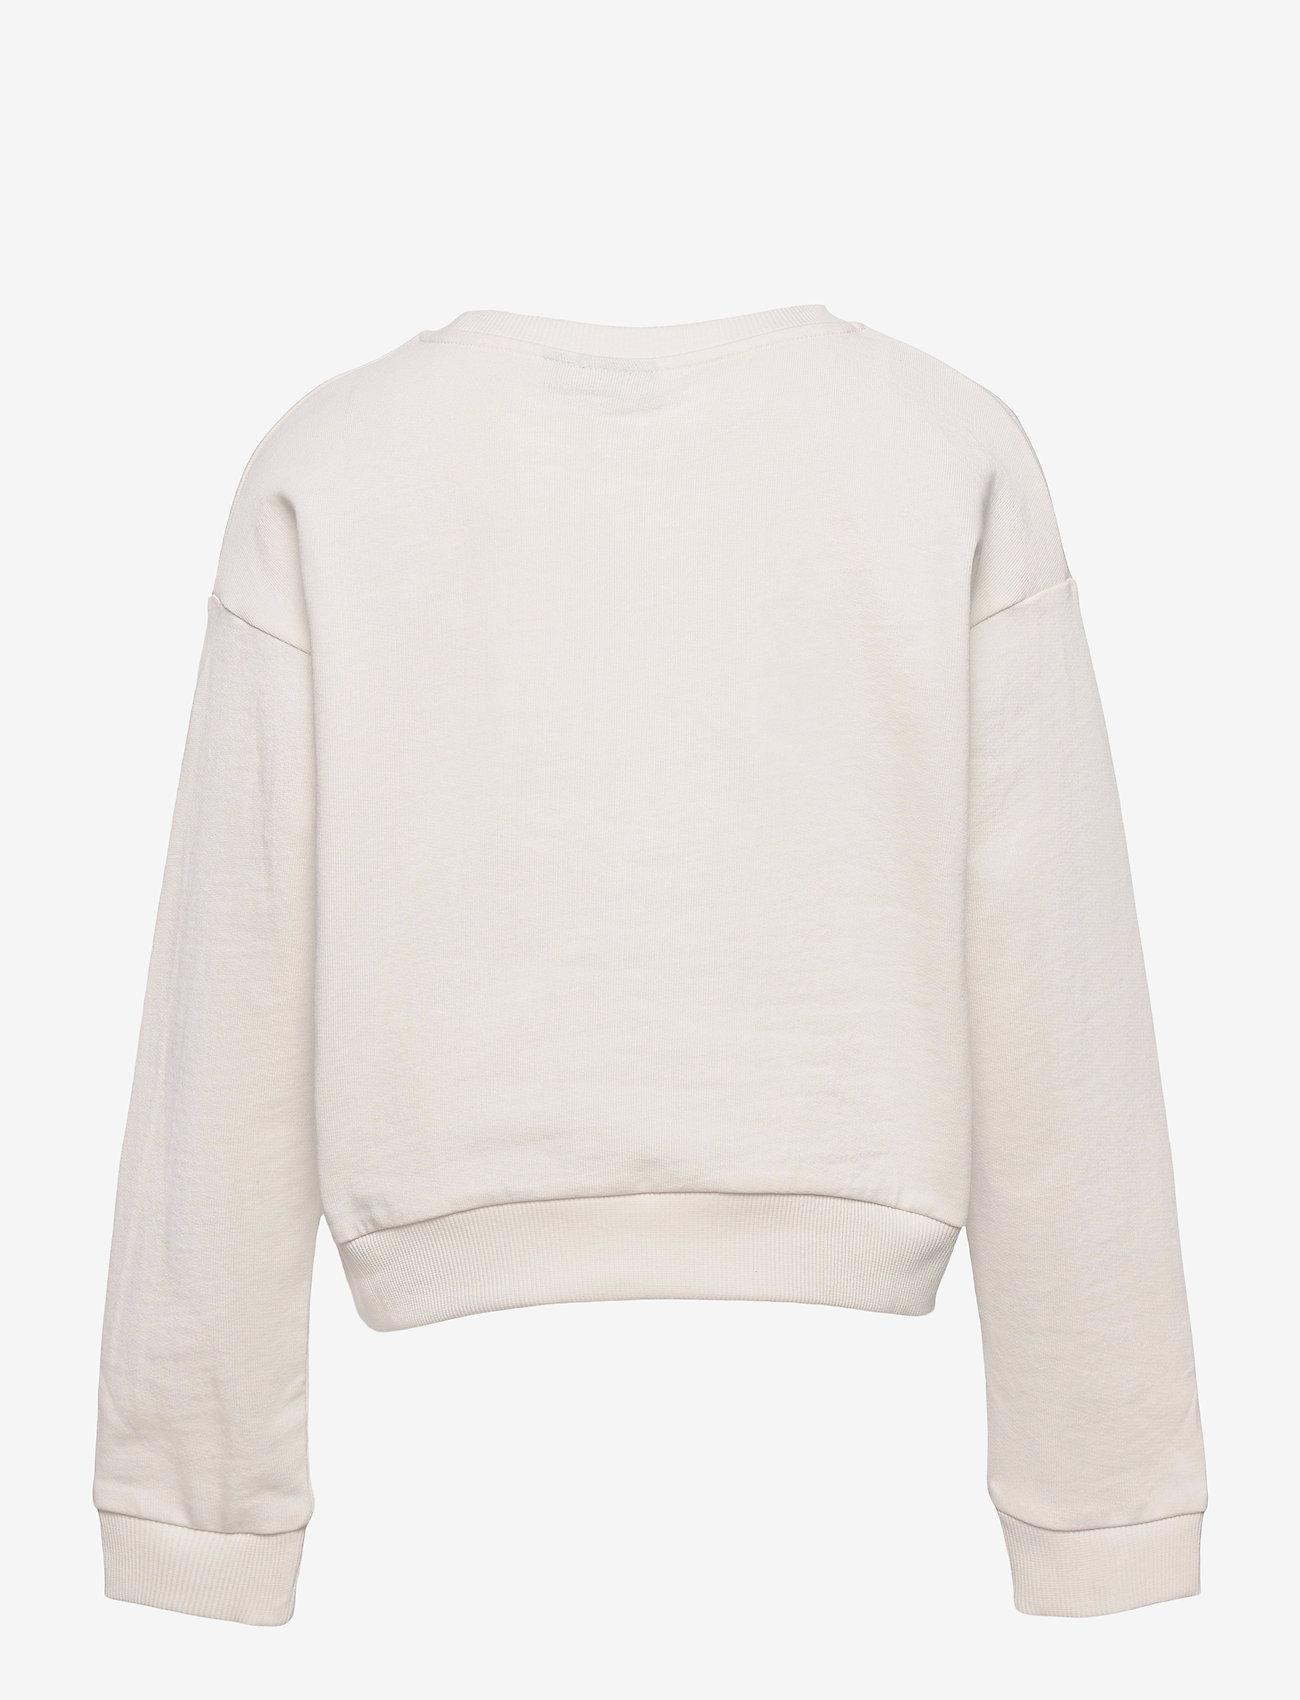 LMTD - NLFFETROS LS SHORT SWEAT - sweatshirts - snow white - 1